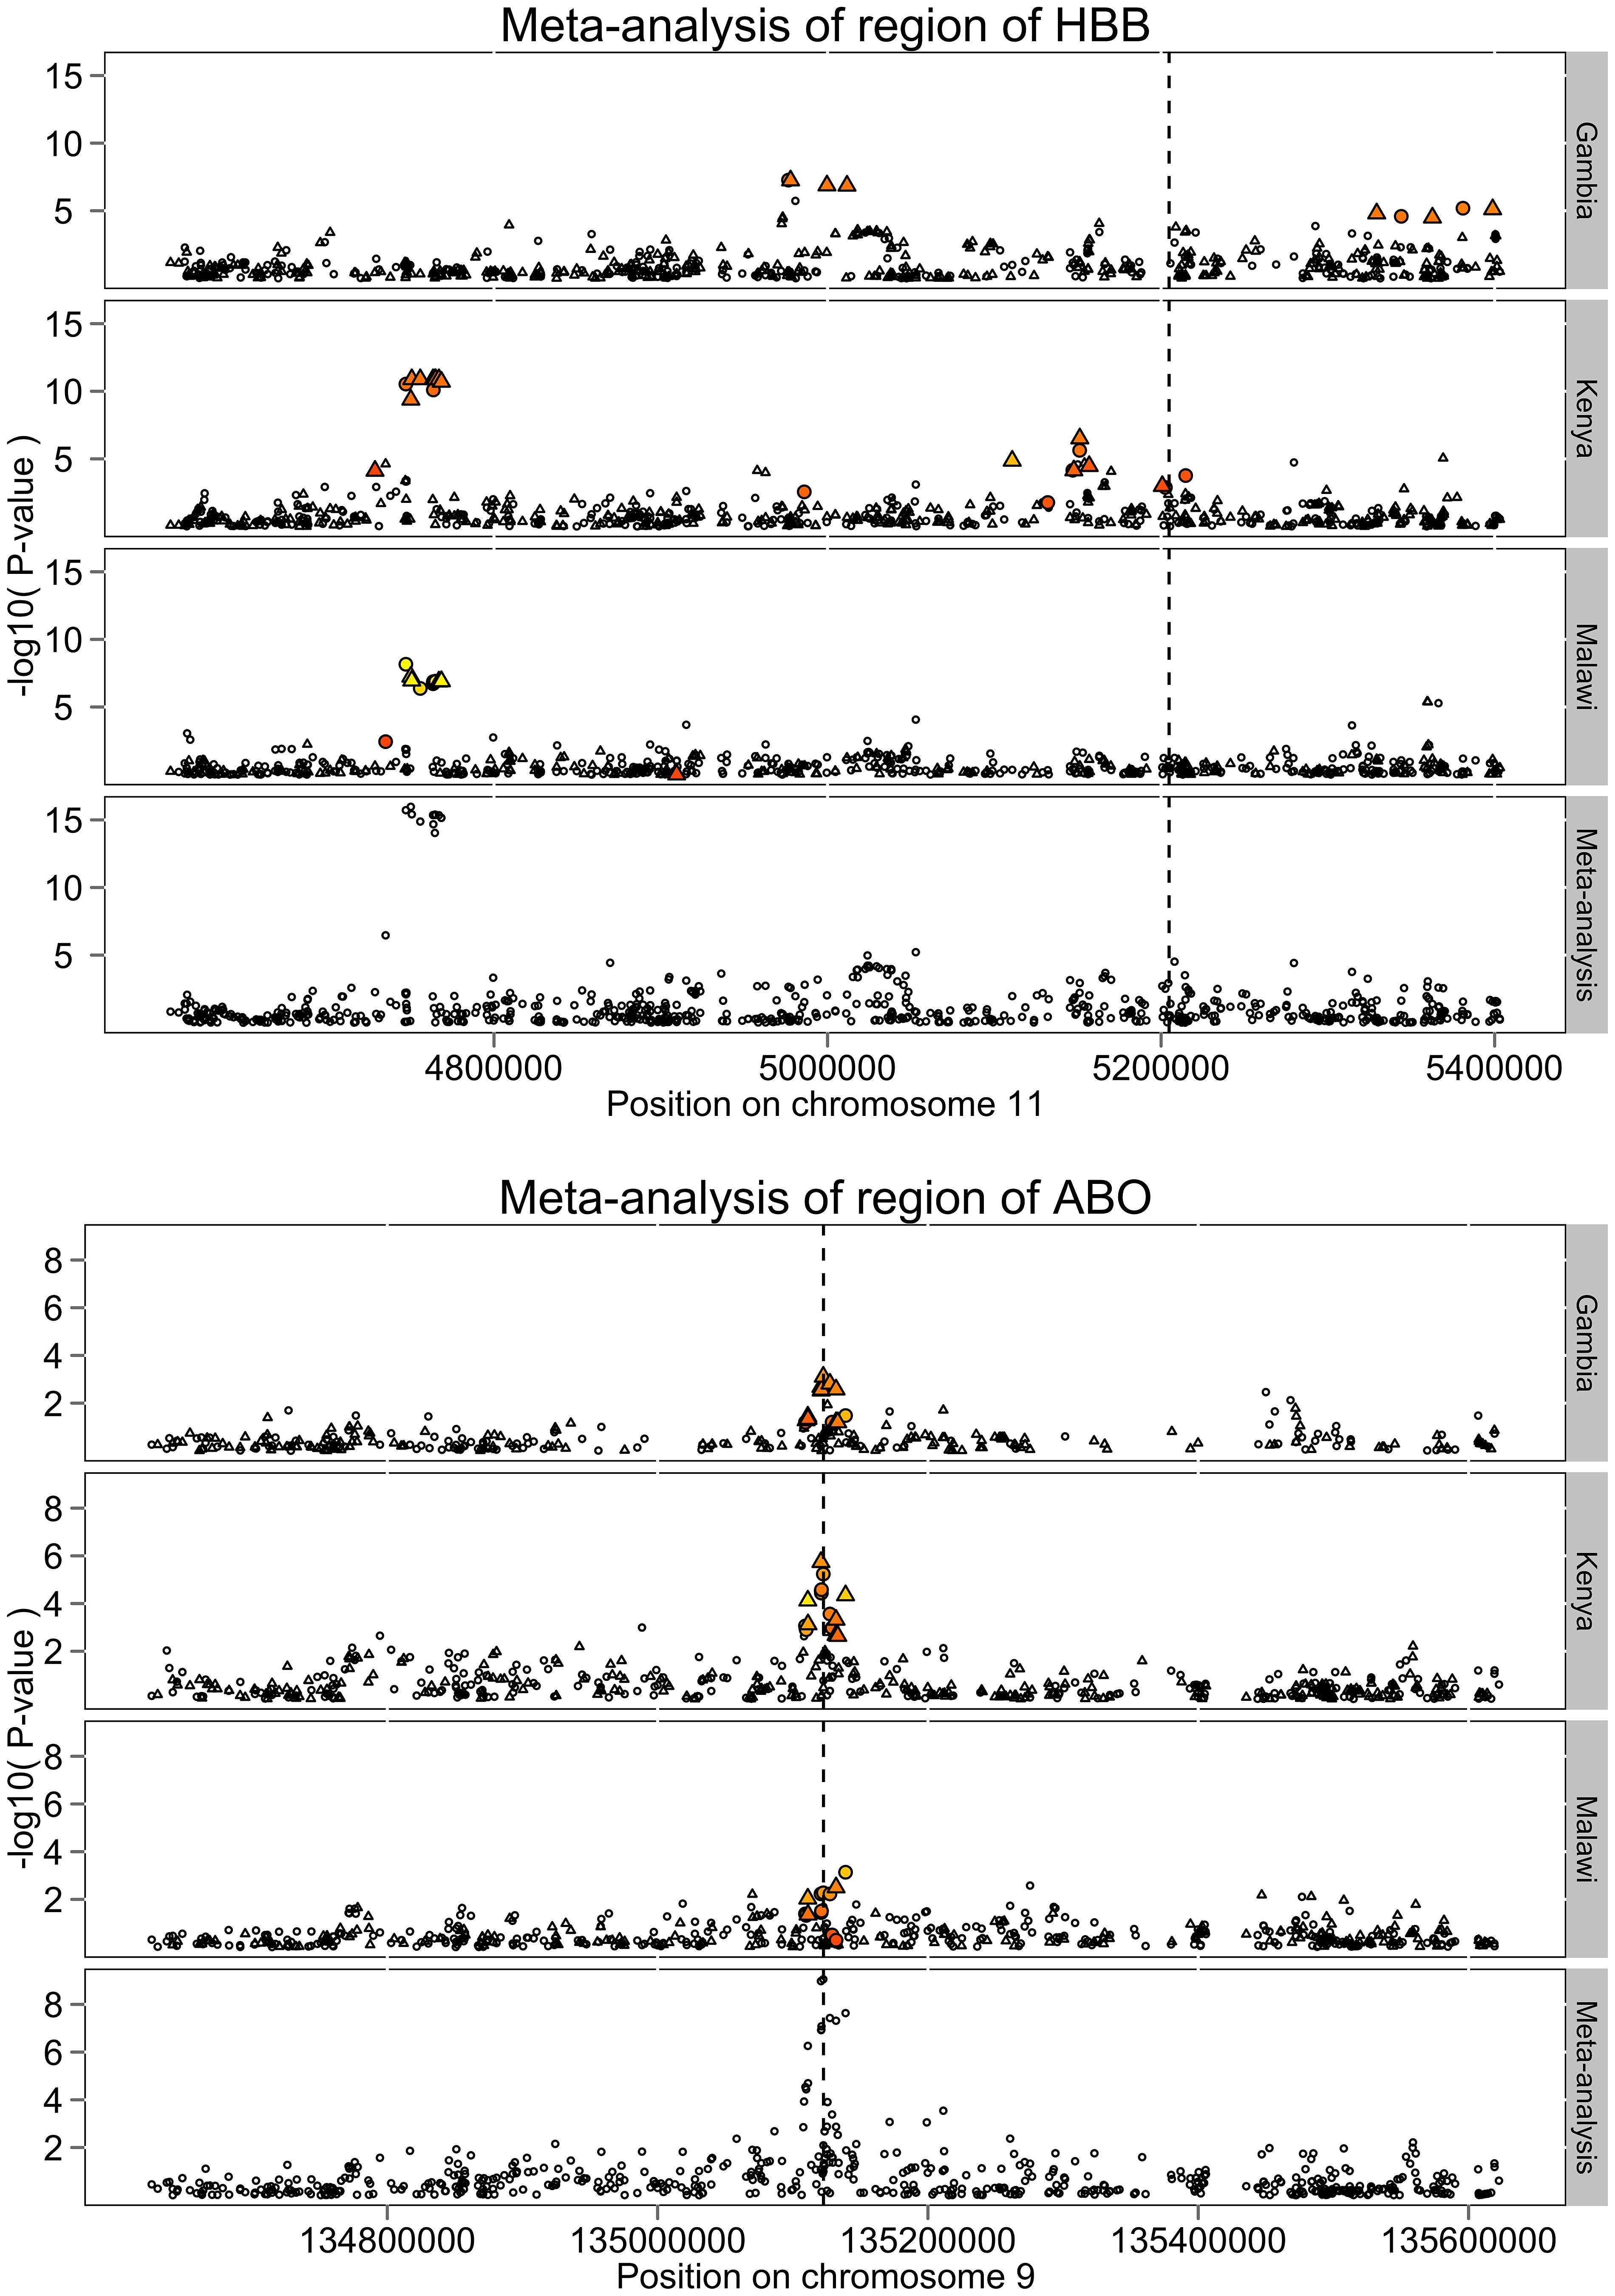 Patterns of association around the <i>HBB</i> and <i>ABO</i> loci.